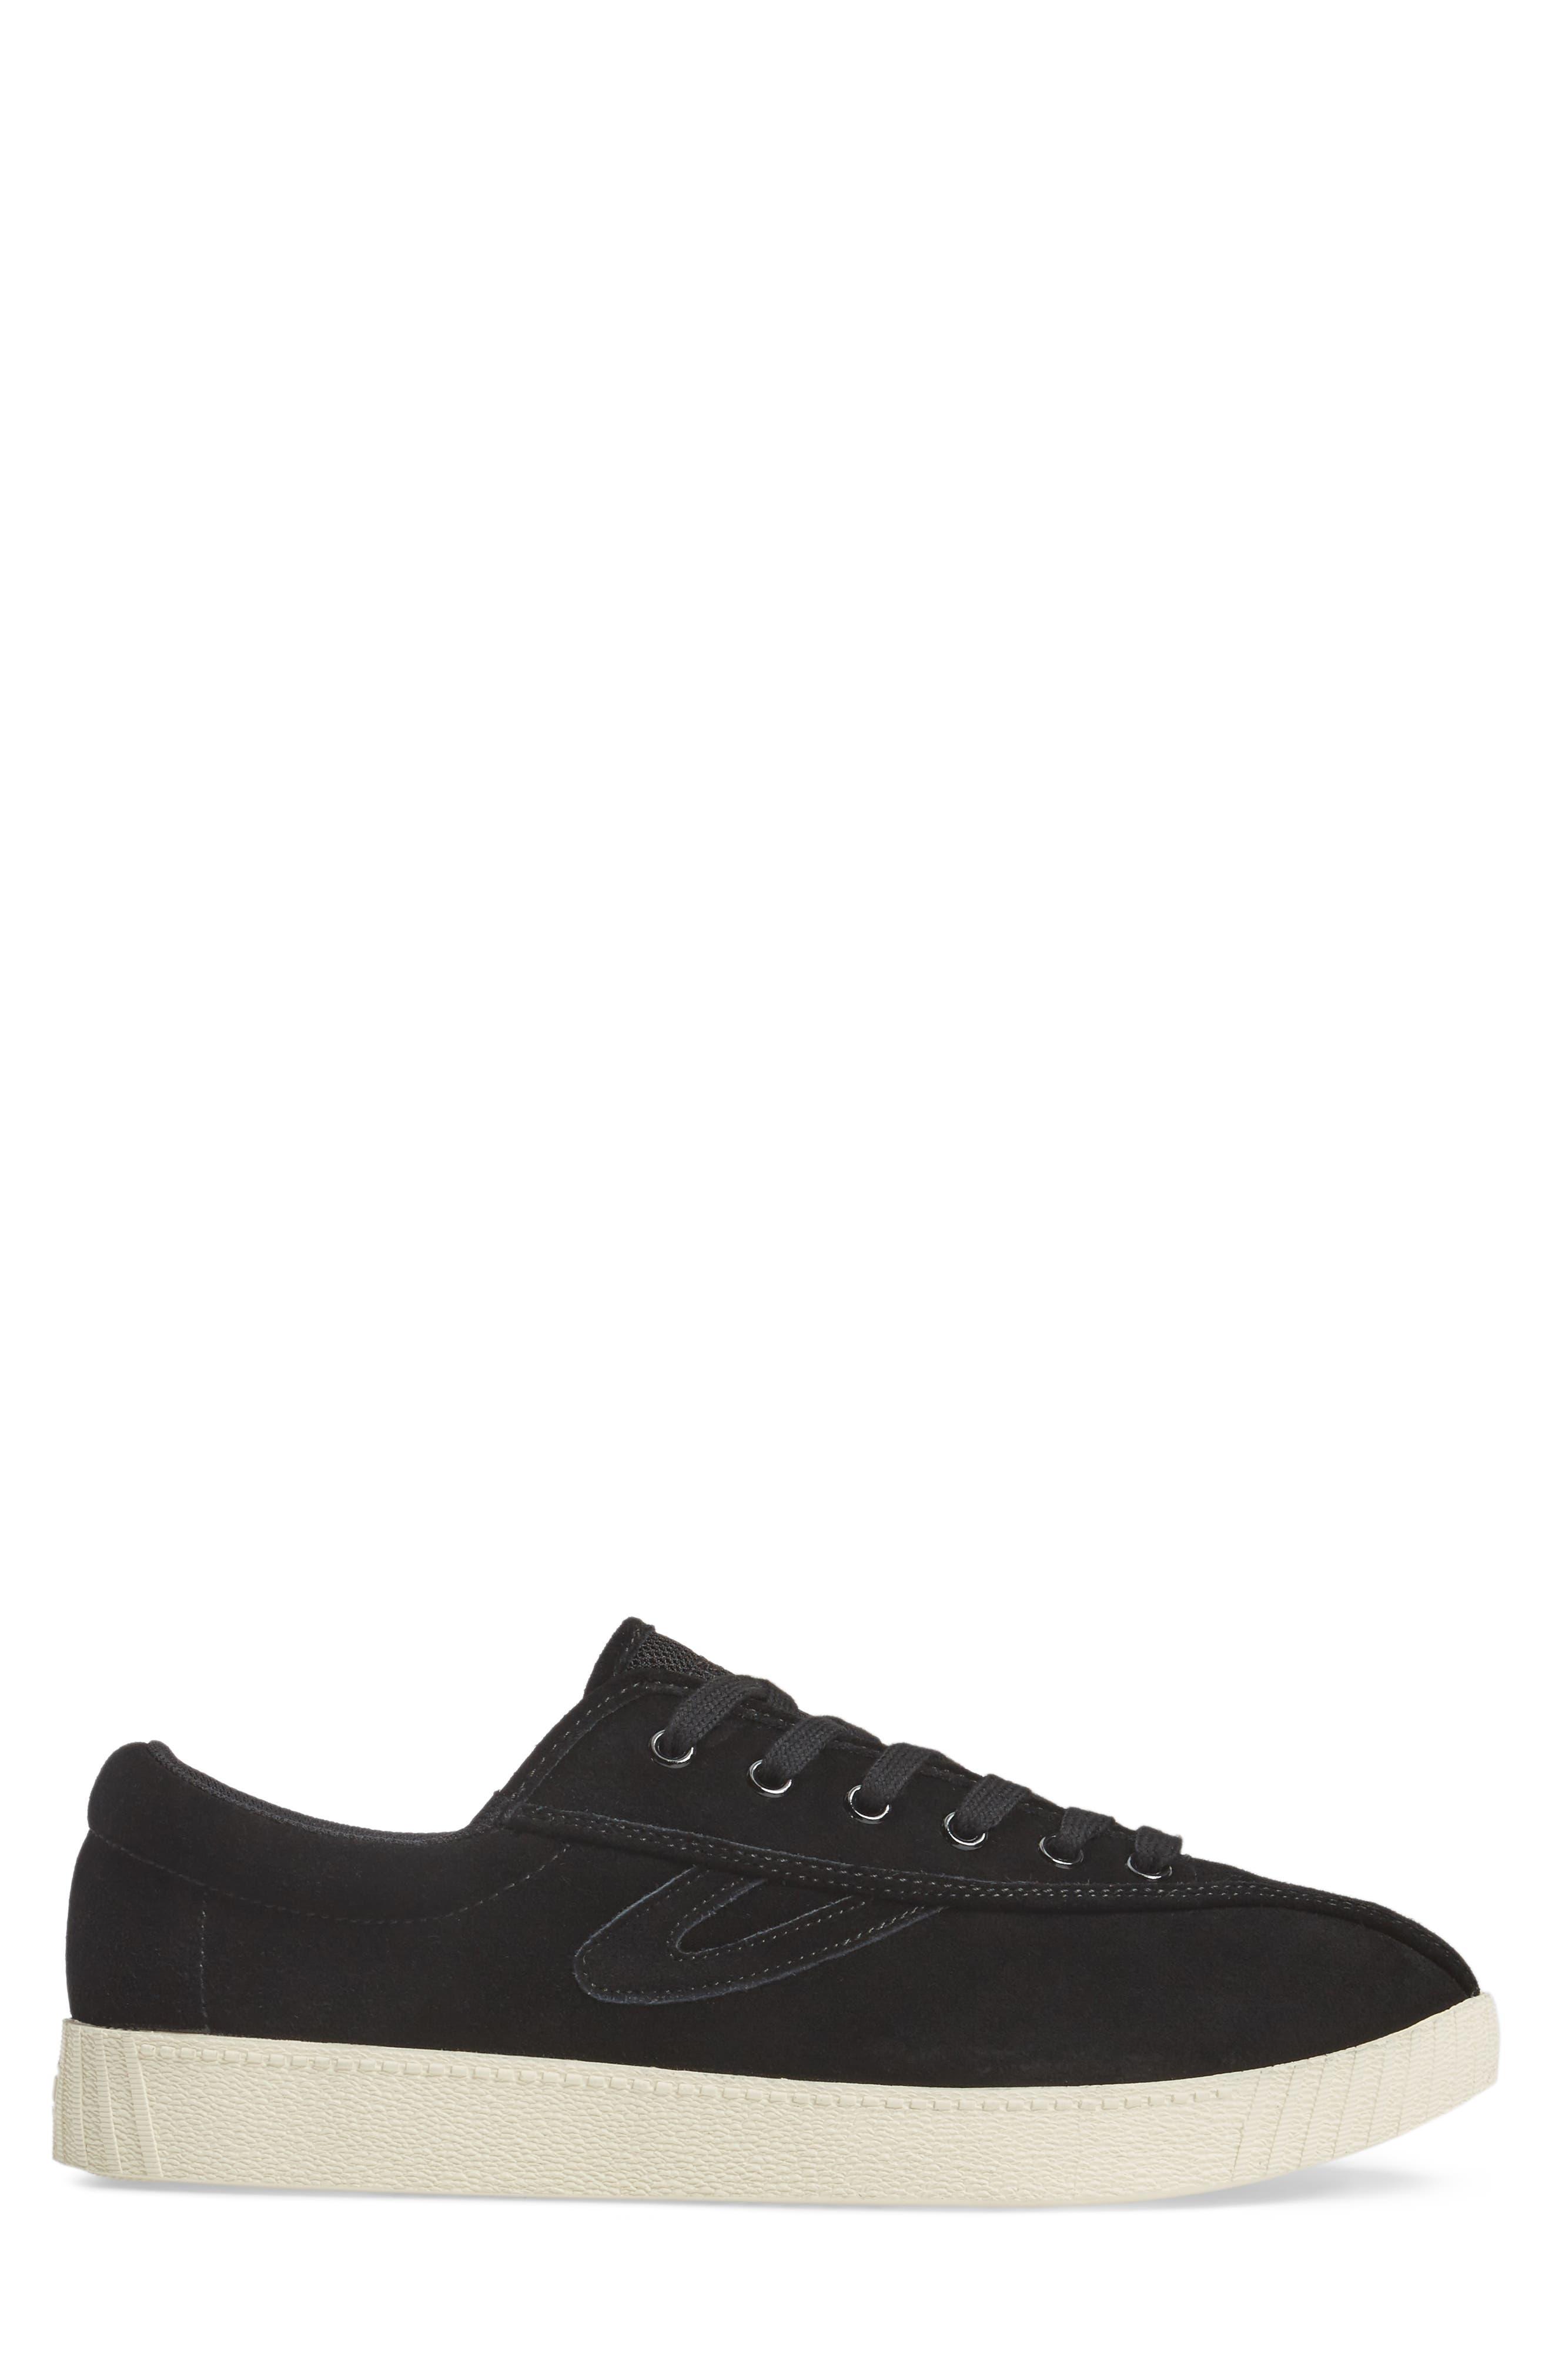 Nylite 16 Sneaker,                             Alternate thumbnail 3, color,                             BLACK/ BLACK SUEDE